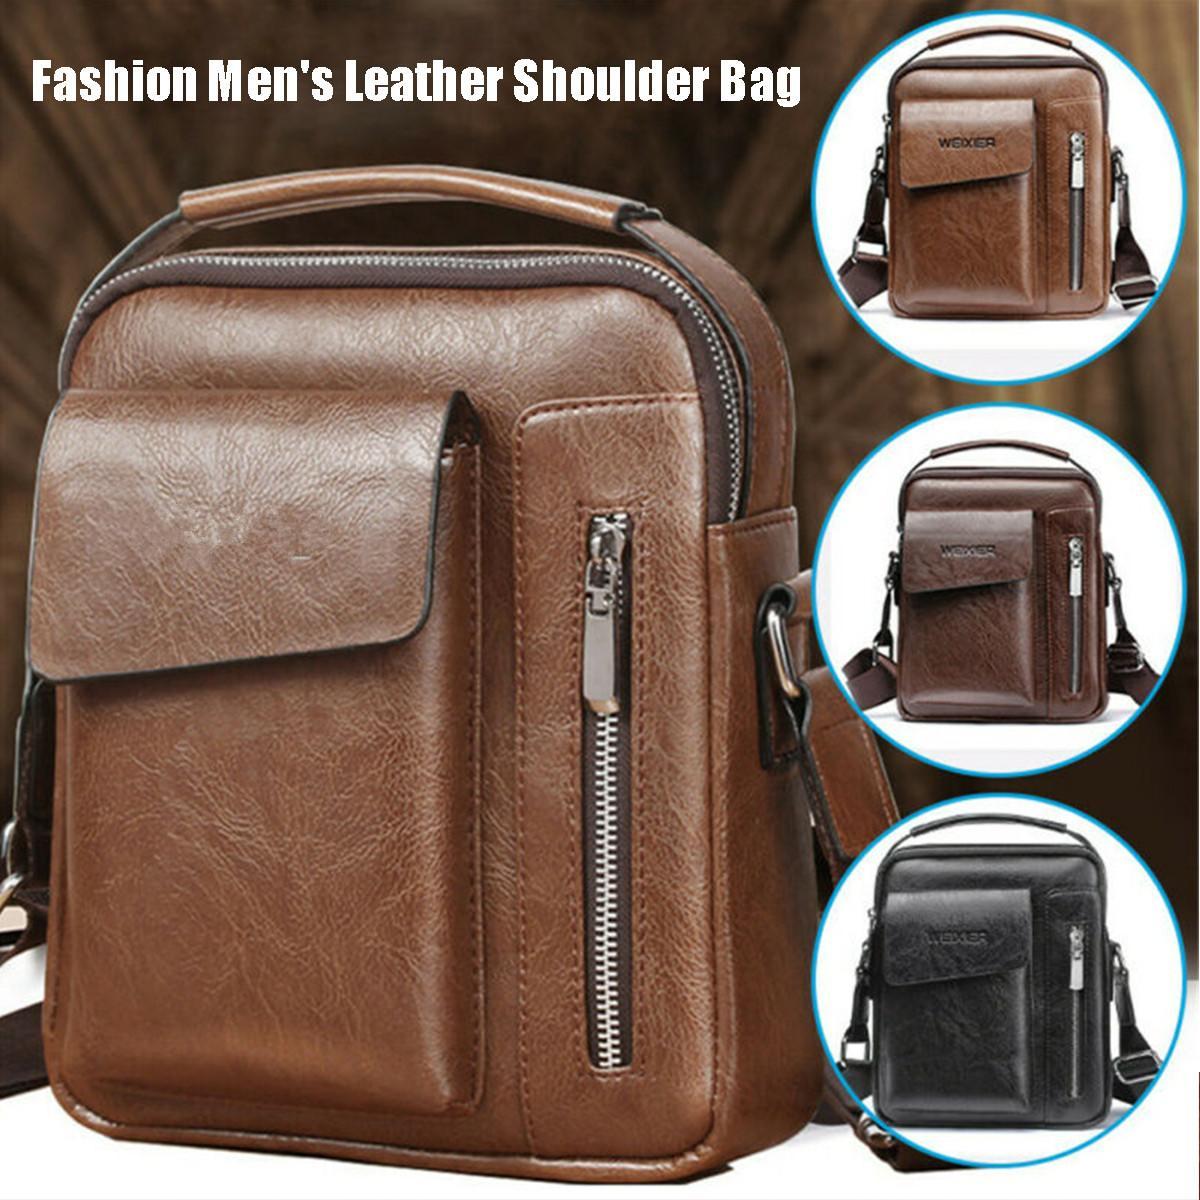 PU Leather Fashion Crossbody Bags Vintage Messenger Bag Men Shoulder Bag For Men Bags Retro Zipper Man Business Handbag